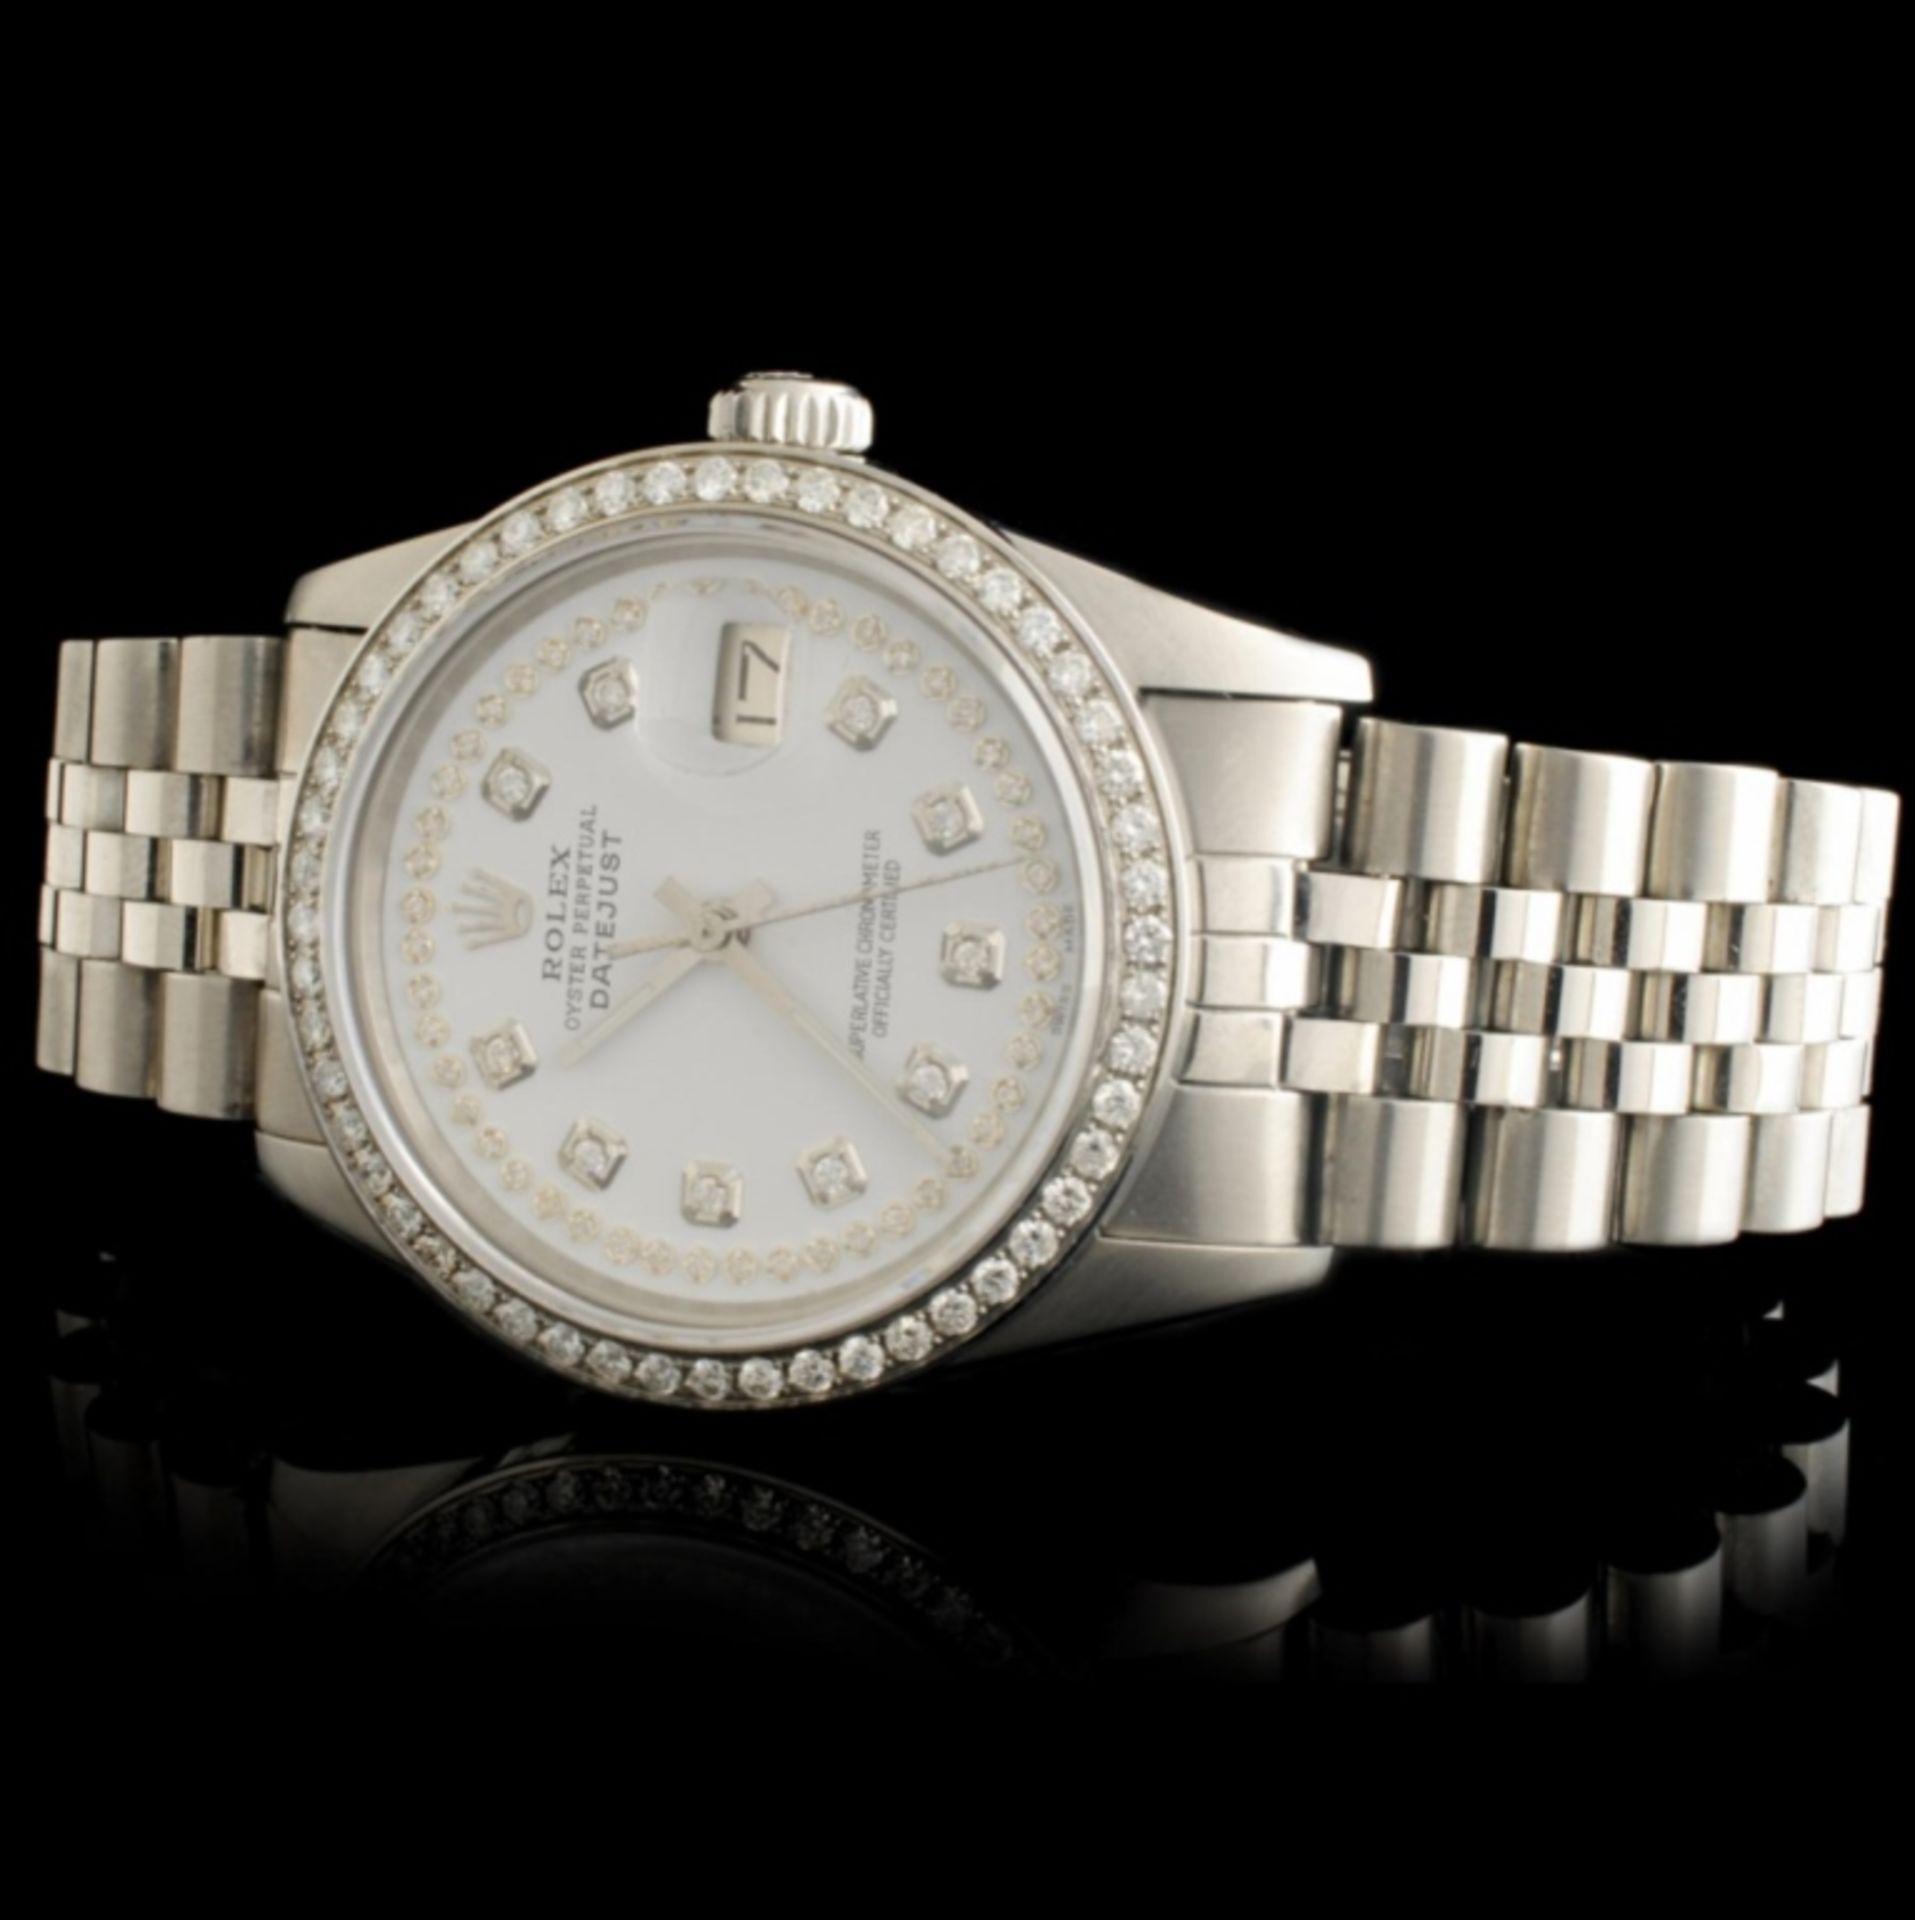 Rolex DateJust Diamond 36MM Wristwatch - Image 2 of 7